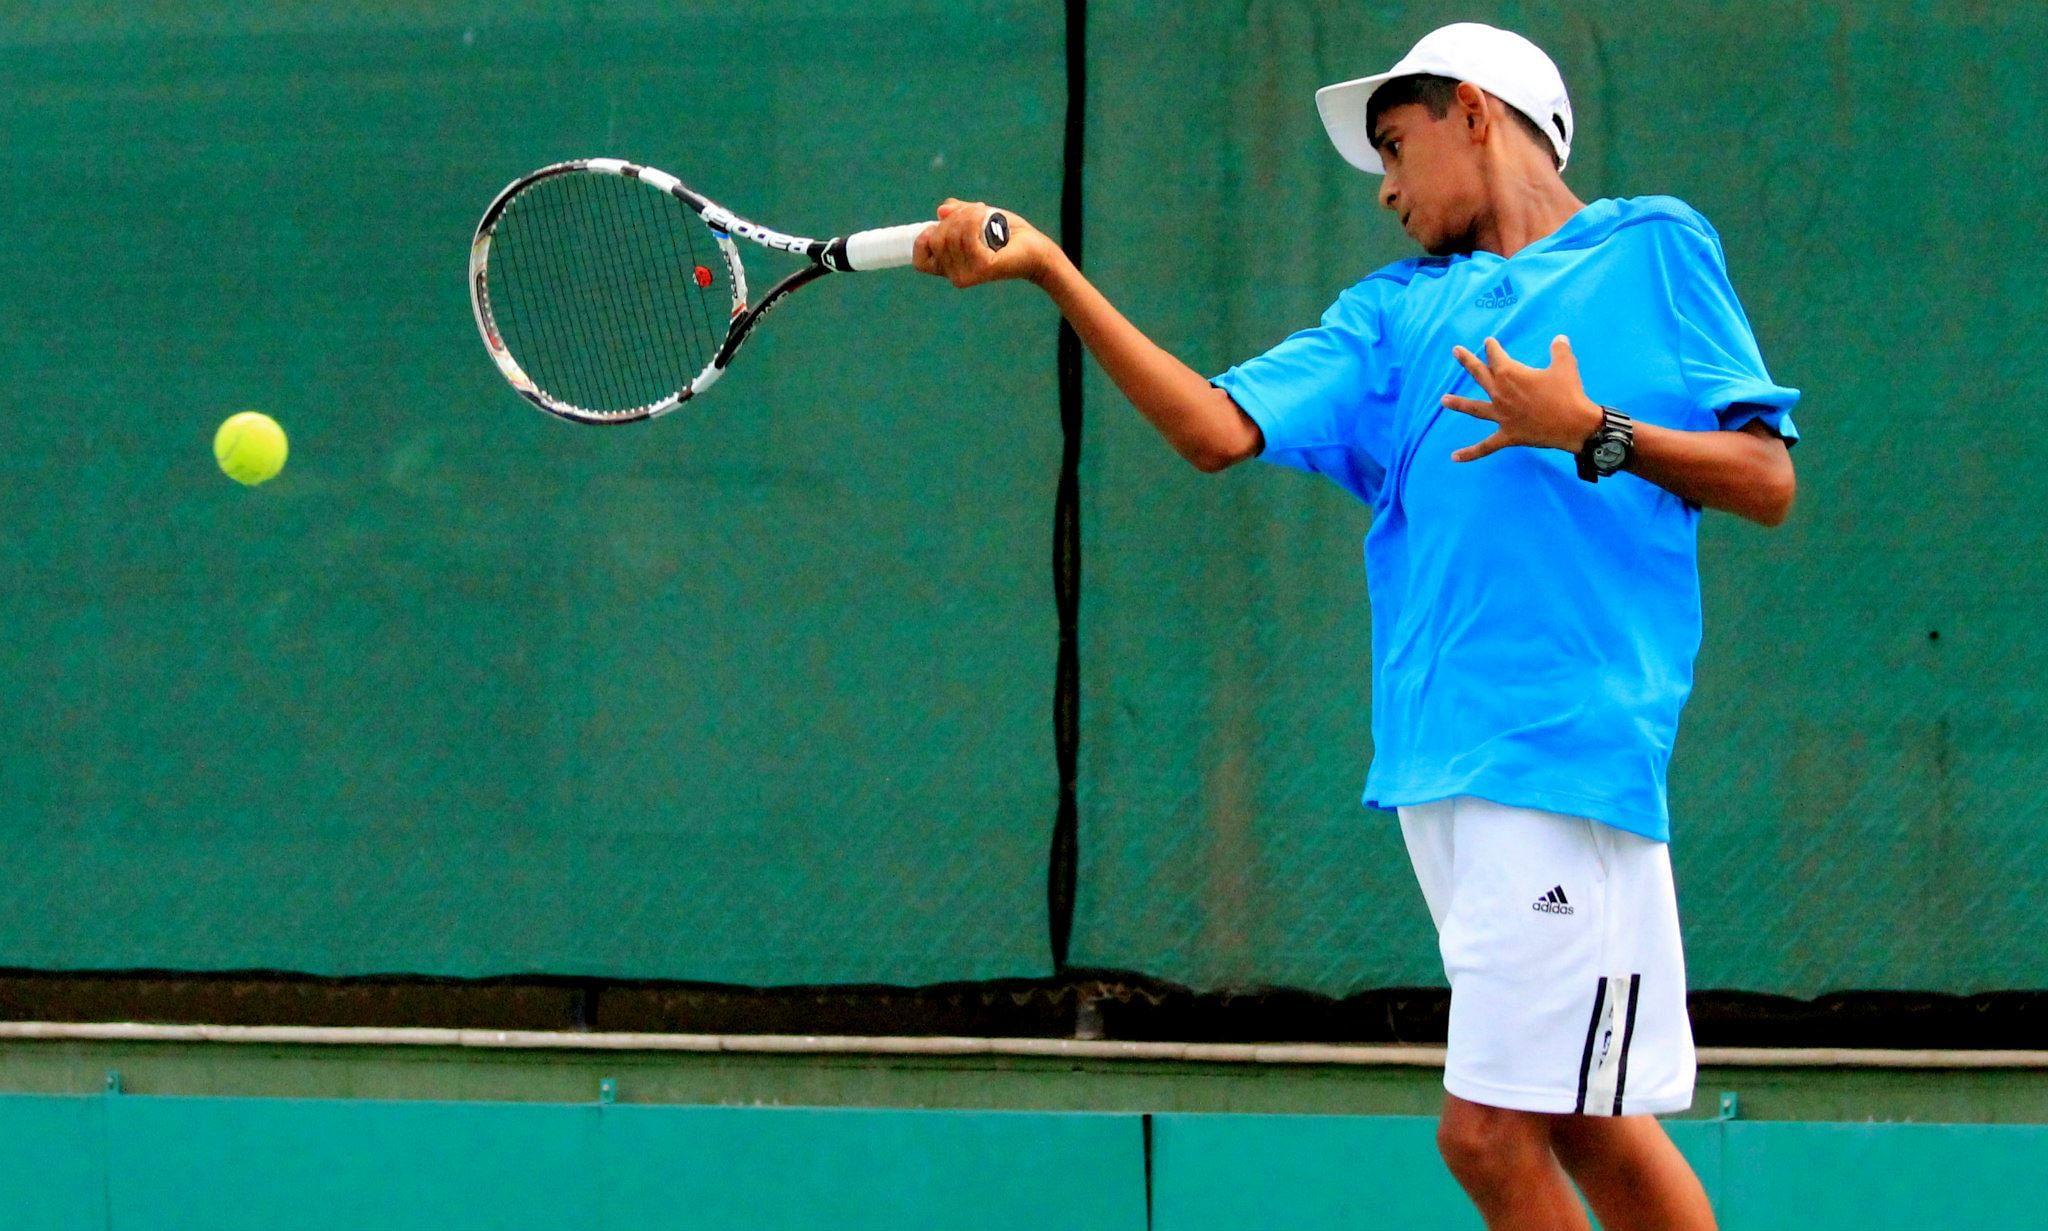 Siddhant Banthia qualifies for 2015 junior Wimbledon